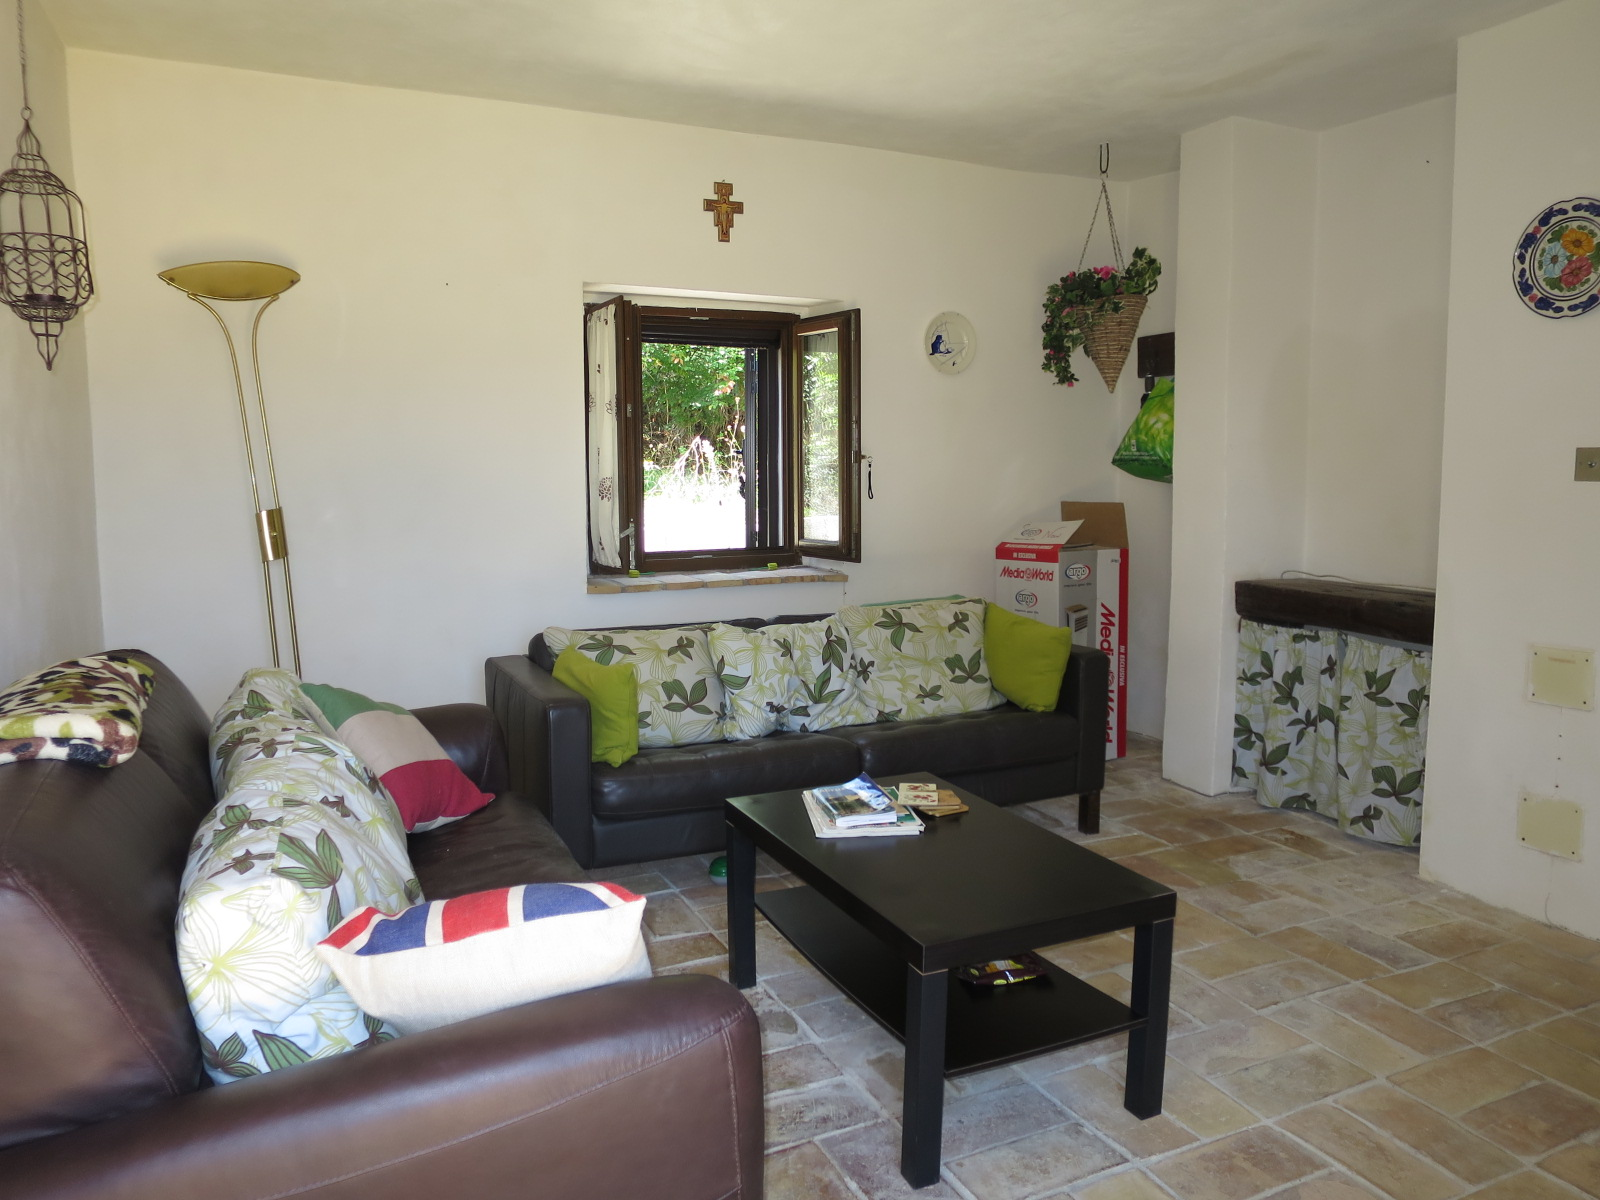 Country Houses Country Houses for sale Montefino (TE), Casa Collina - Montefino - EUR 159.972 320